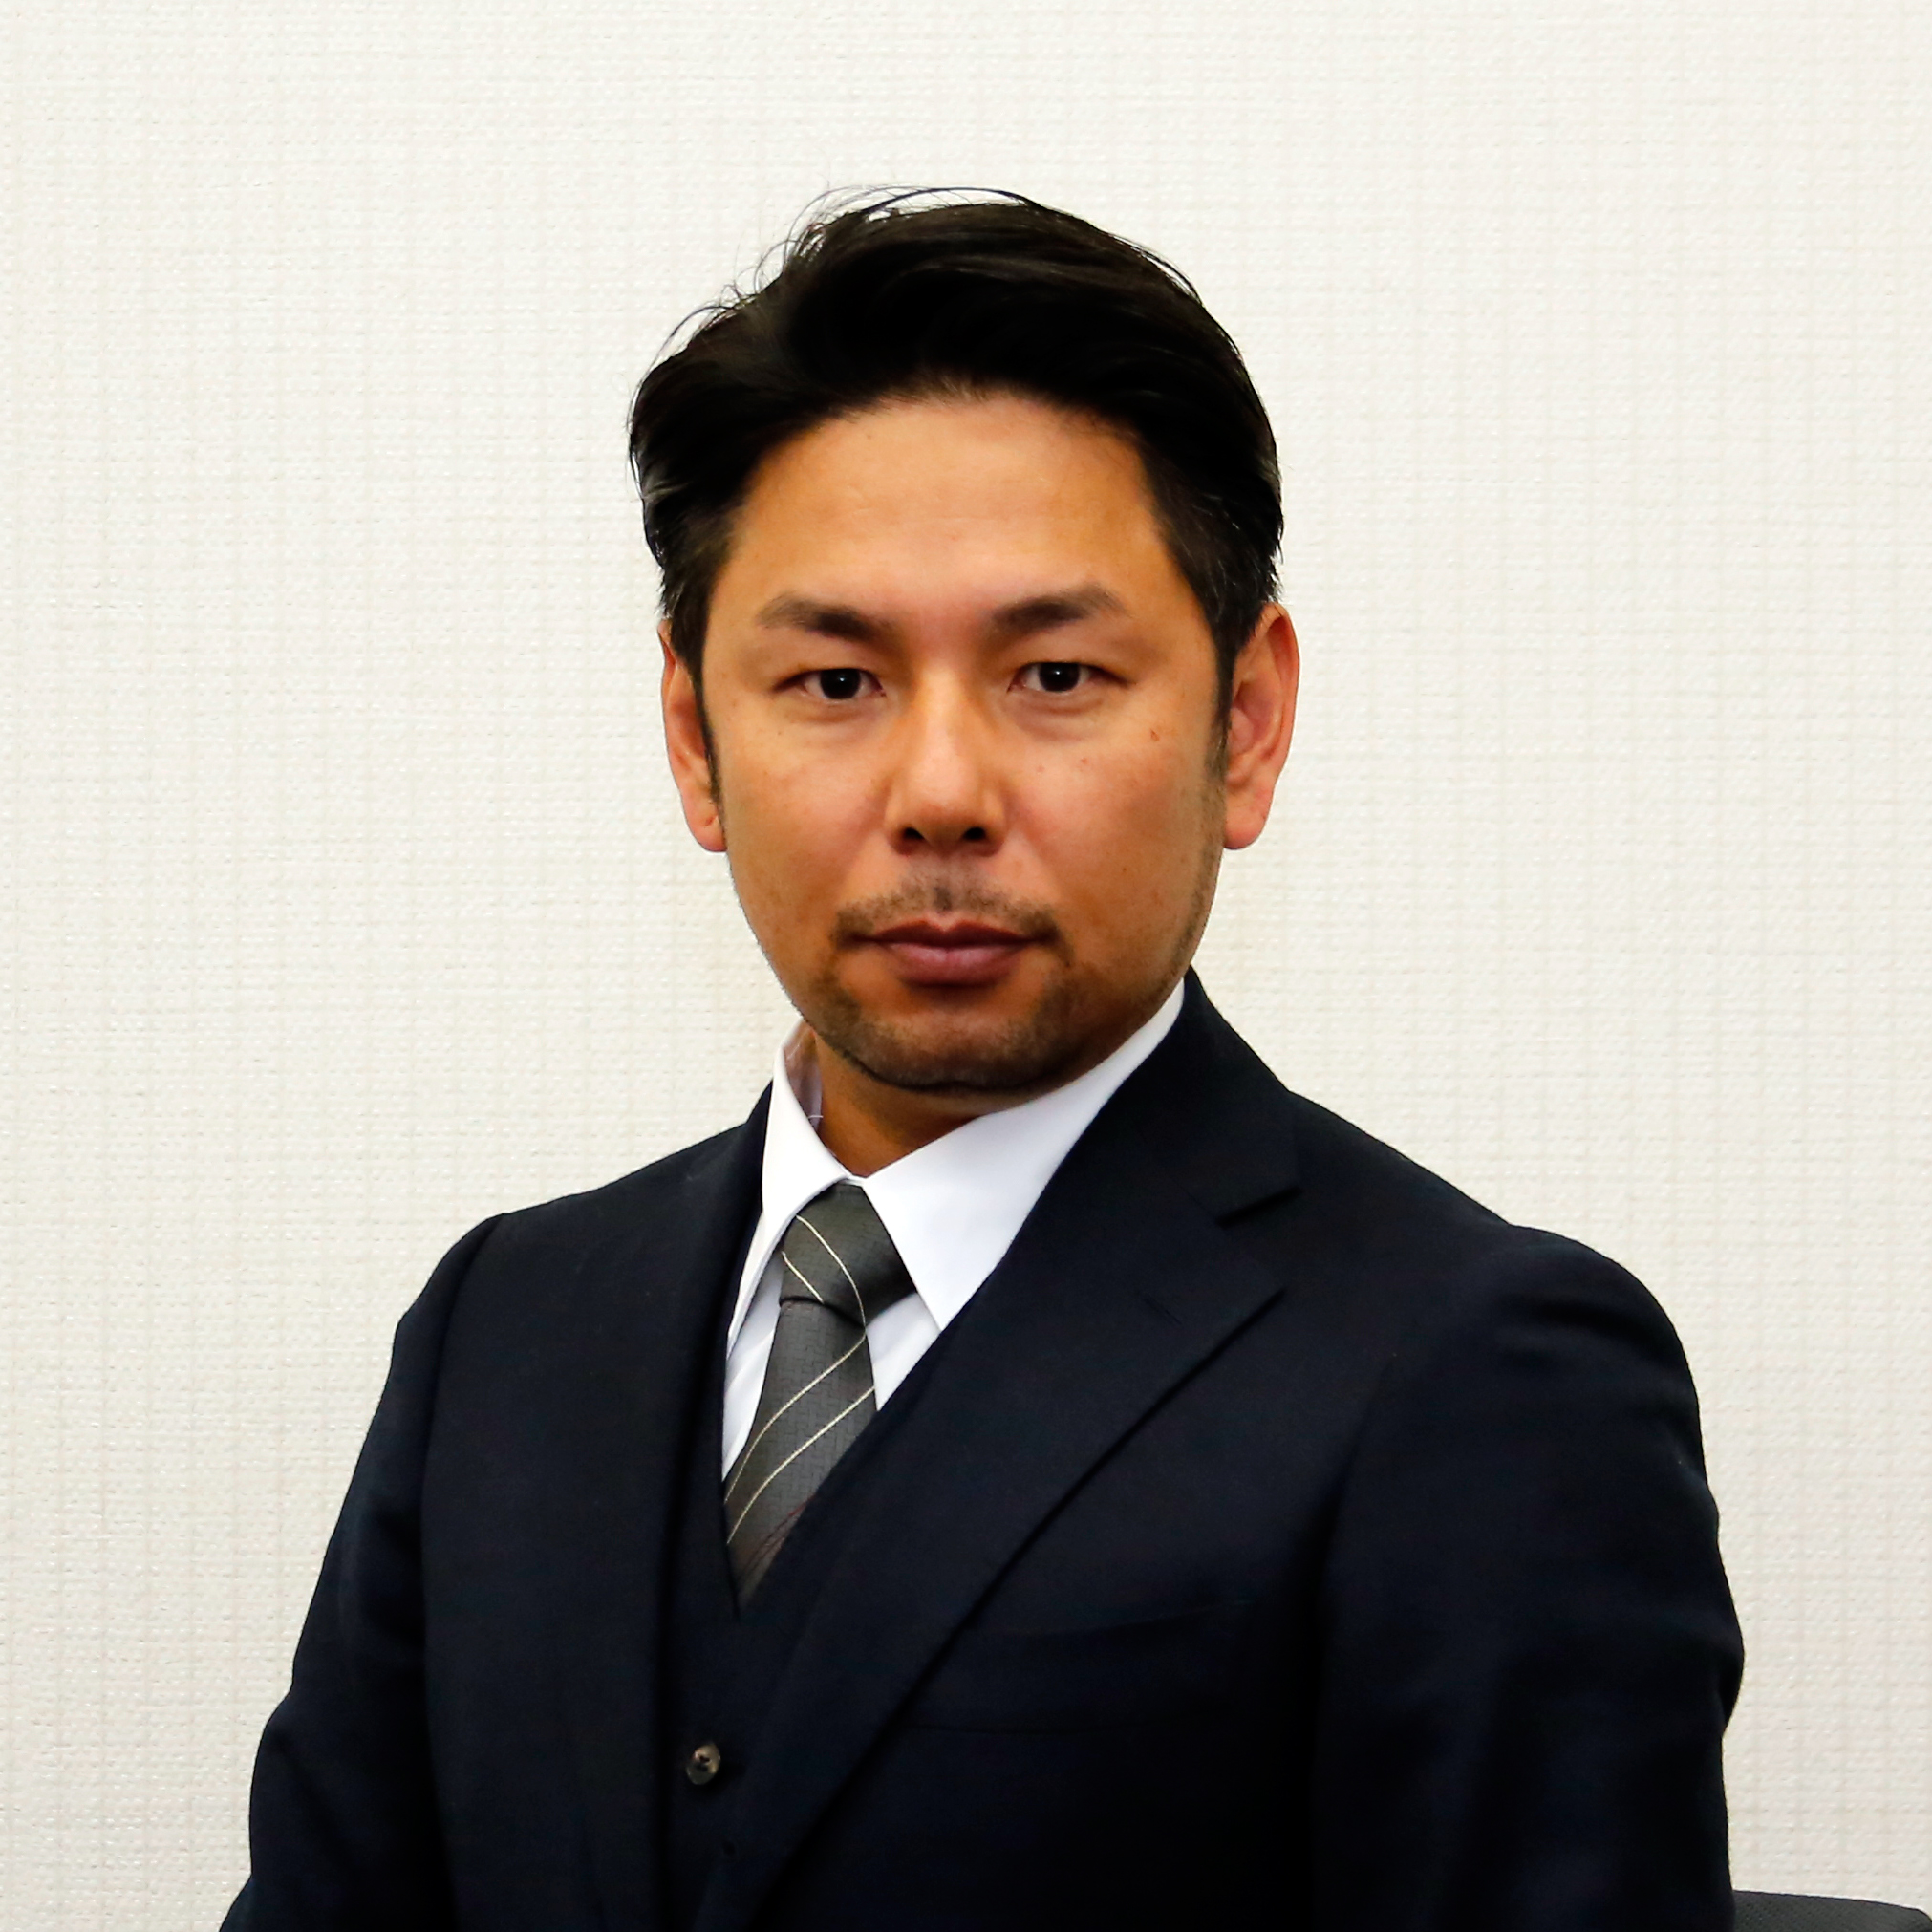 Keisuke Nakano